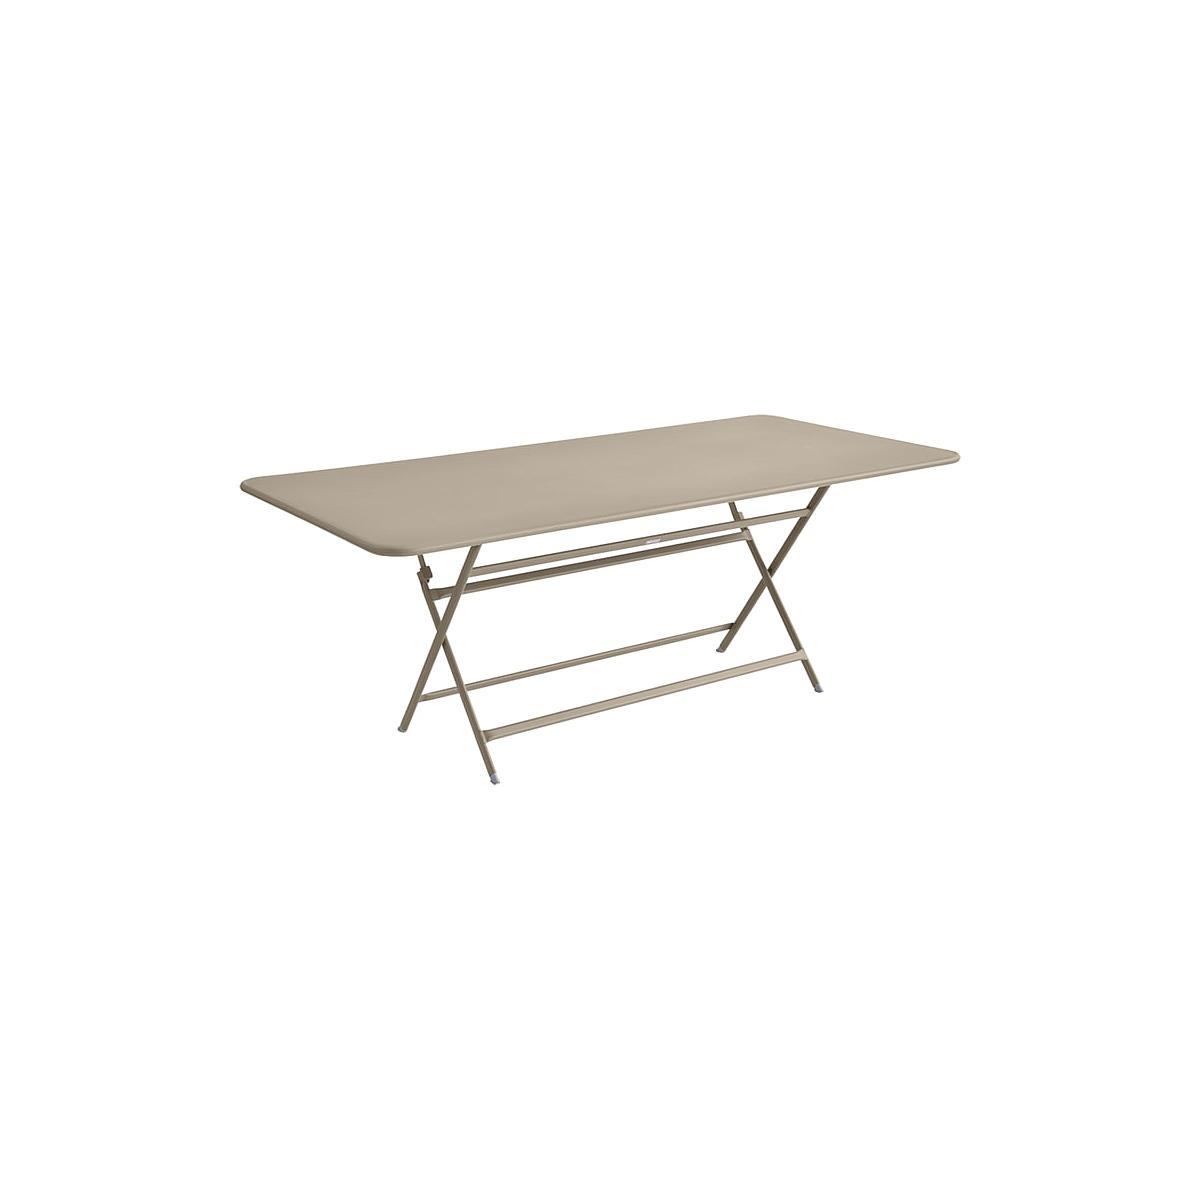 Table 90x190cm pliante CARACTERE Fermob Muscade